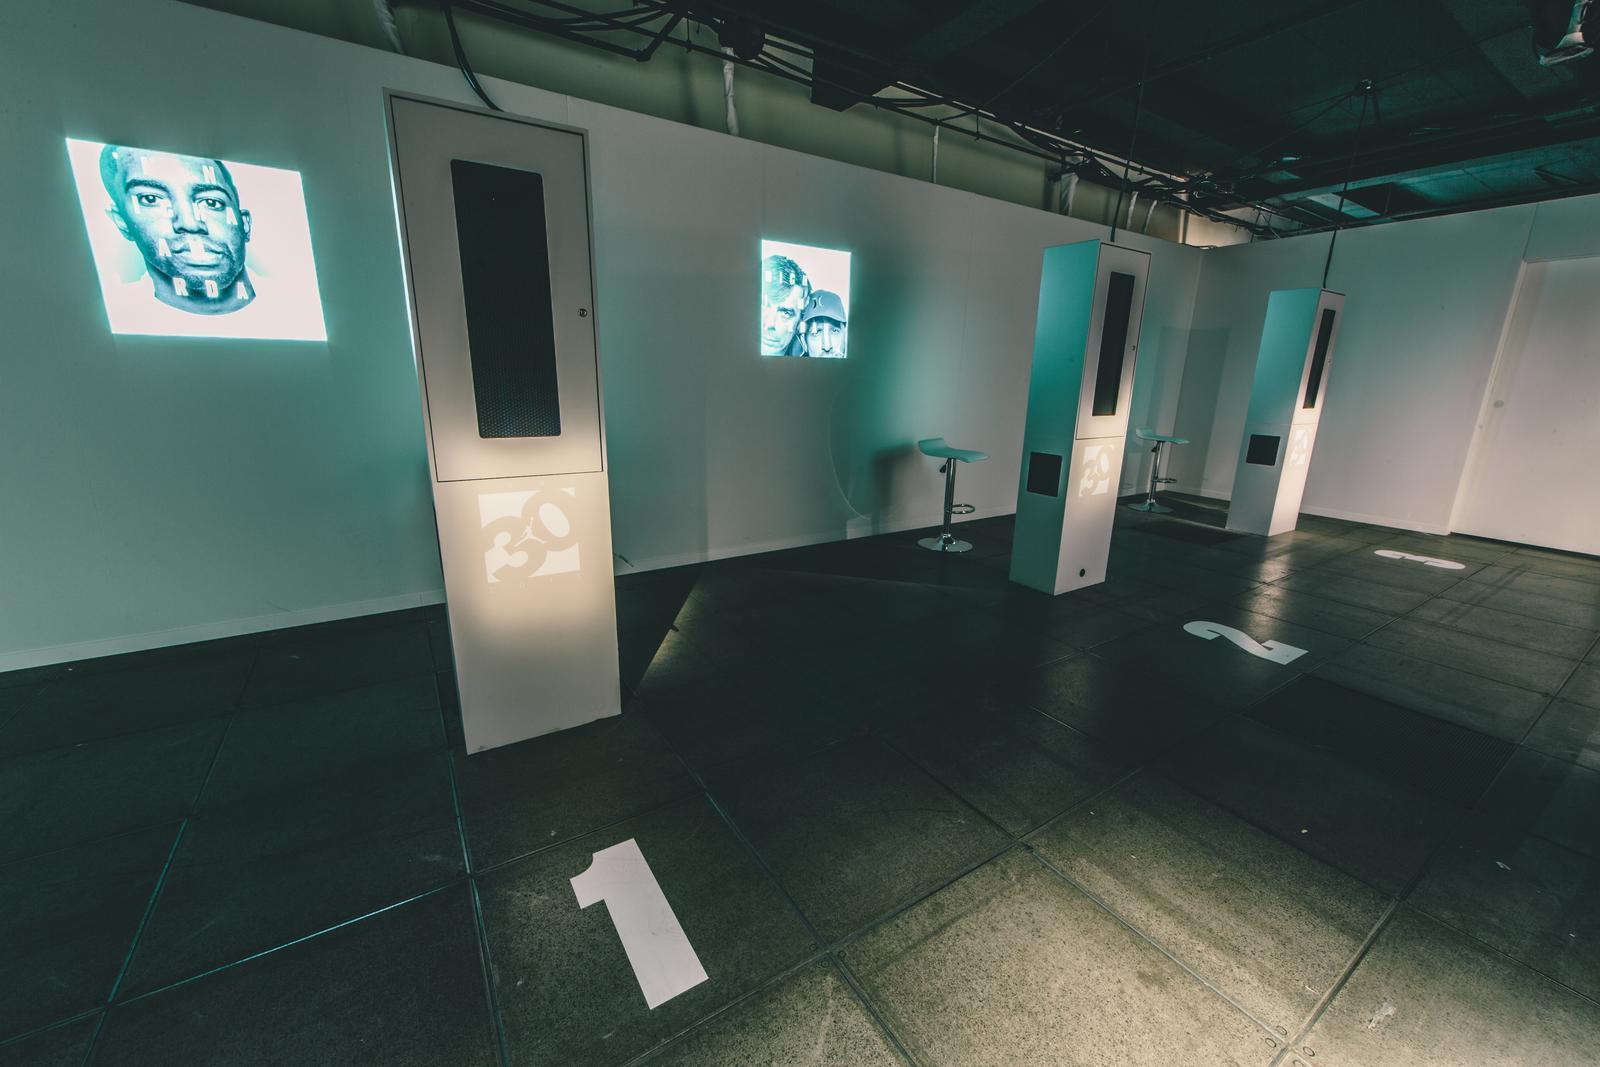 Jordan Brand's Pearl Pavilion: Consumer Photo Booth